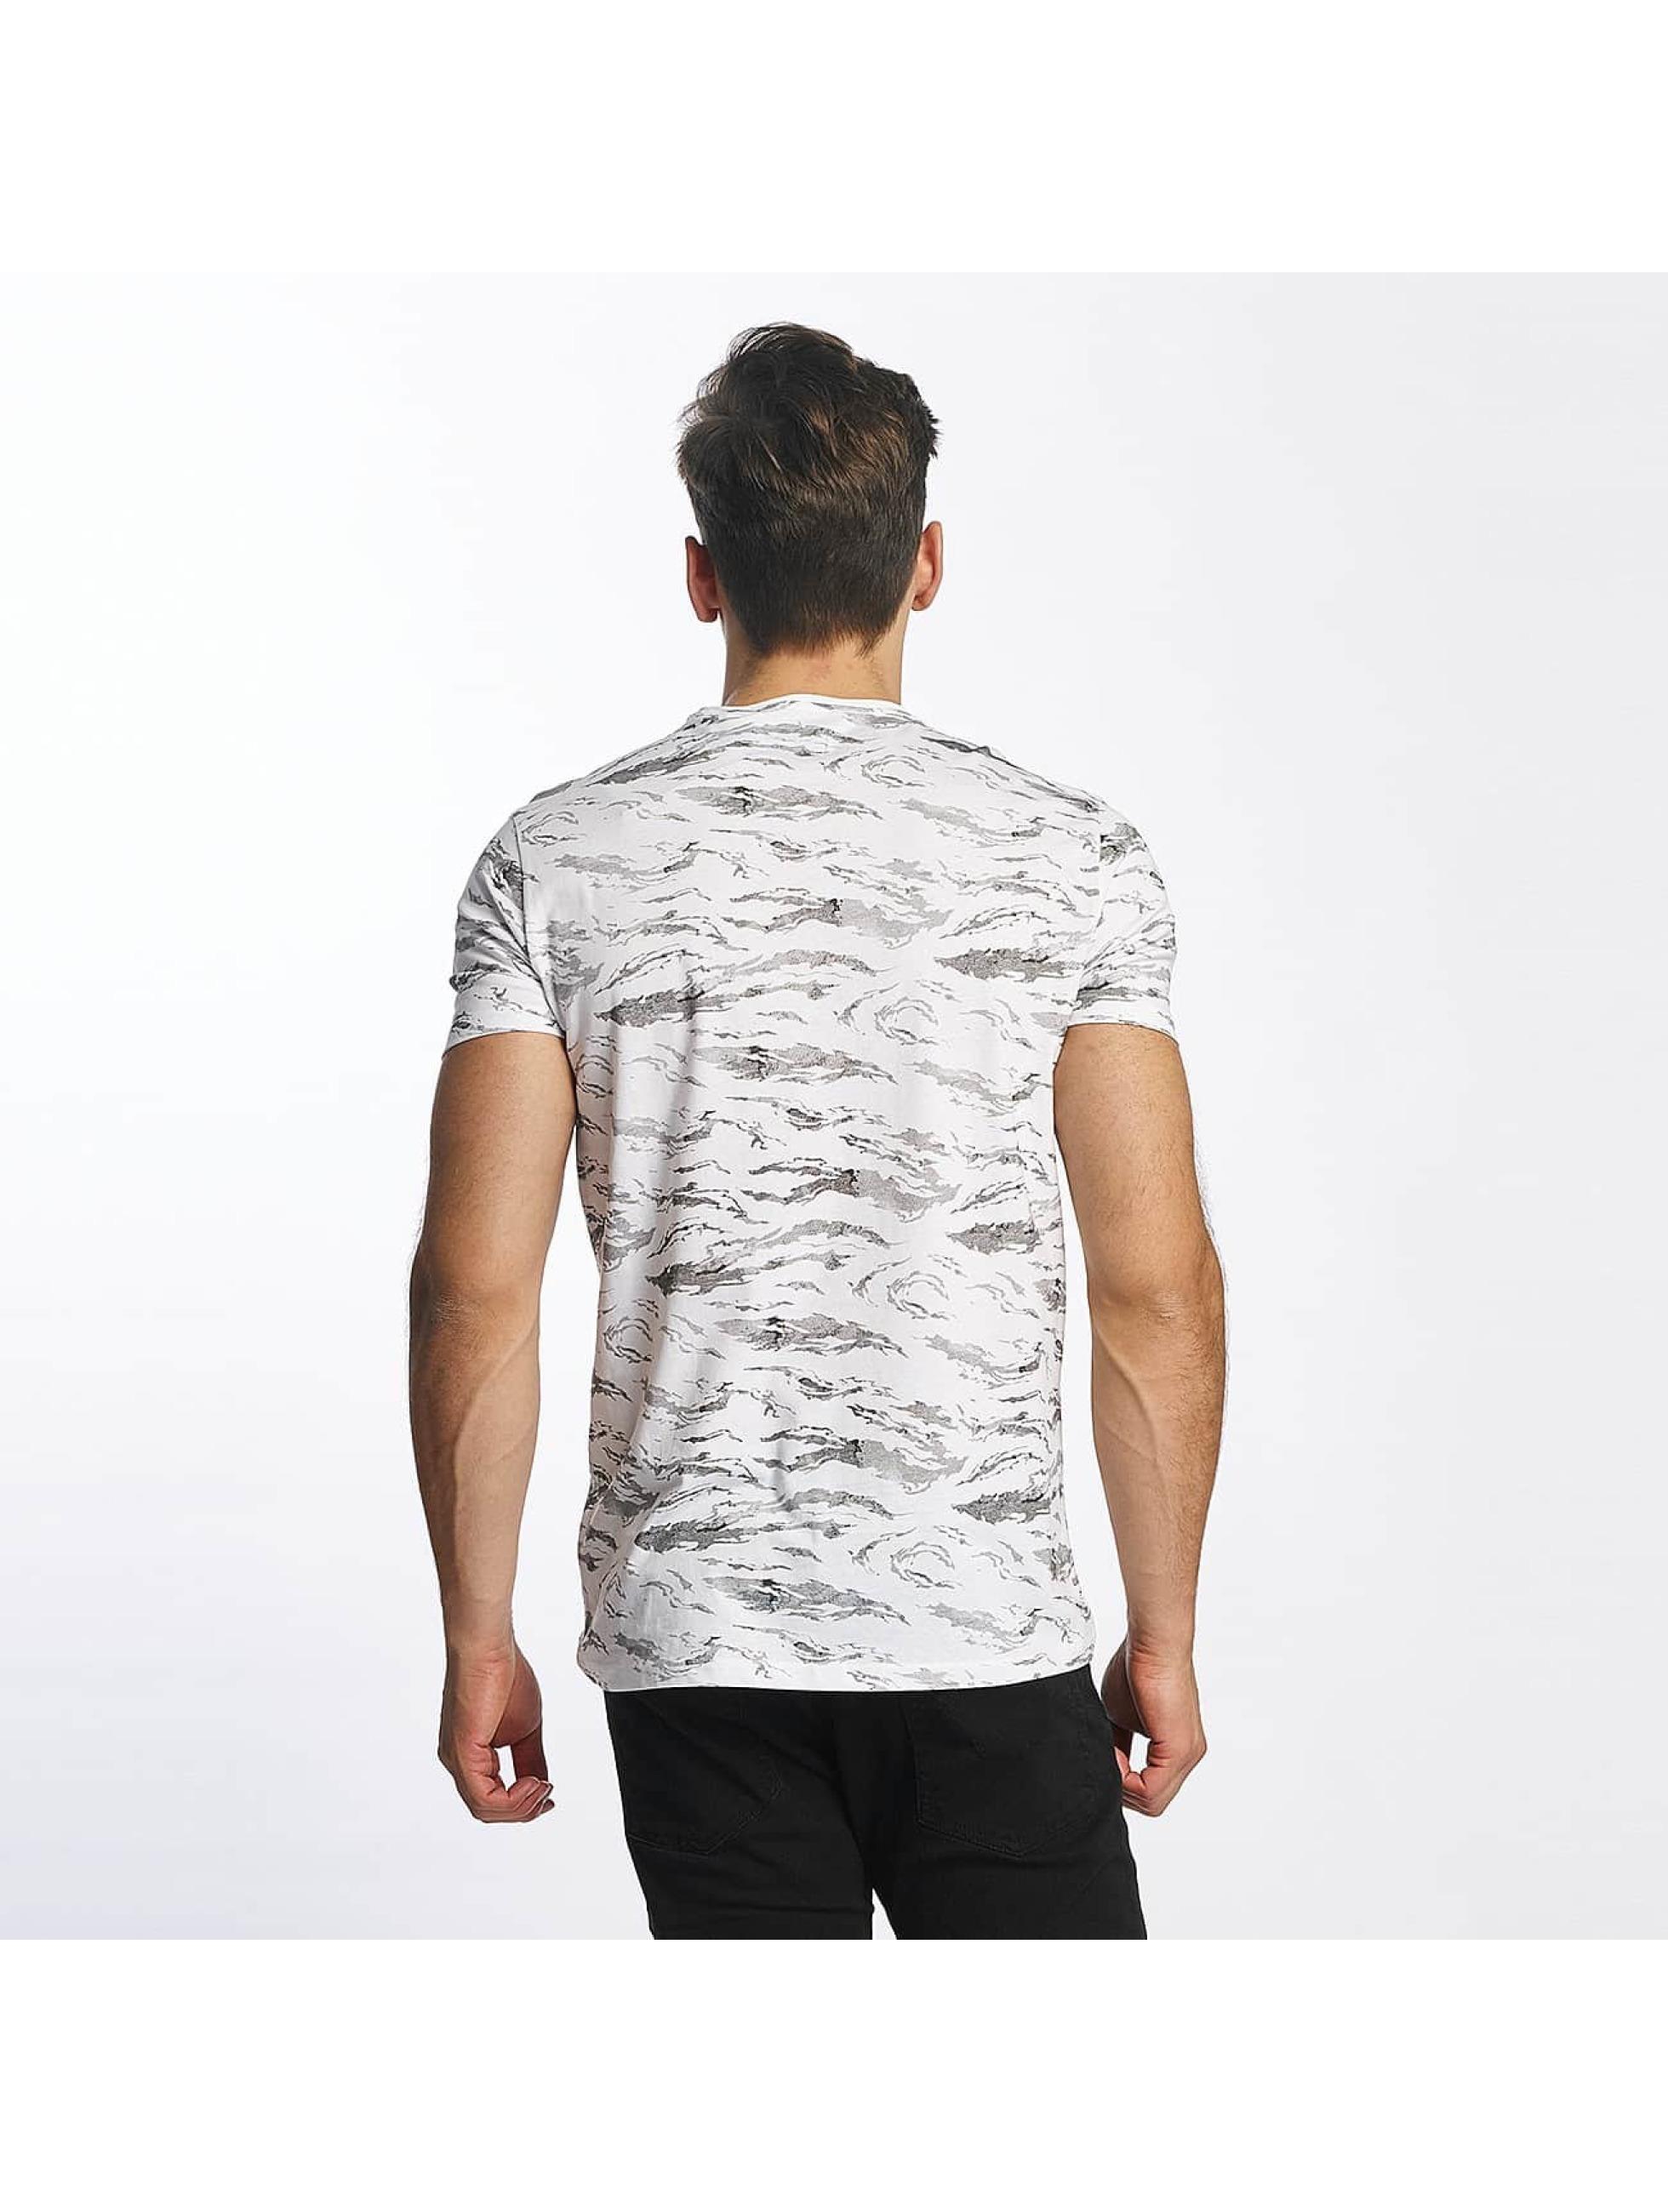 SHINE Original T-Shirt All Over Print white